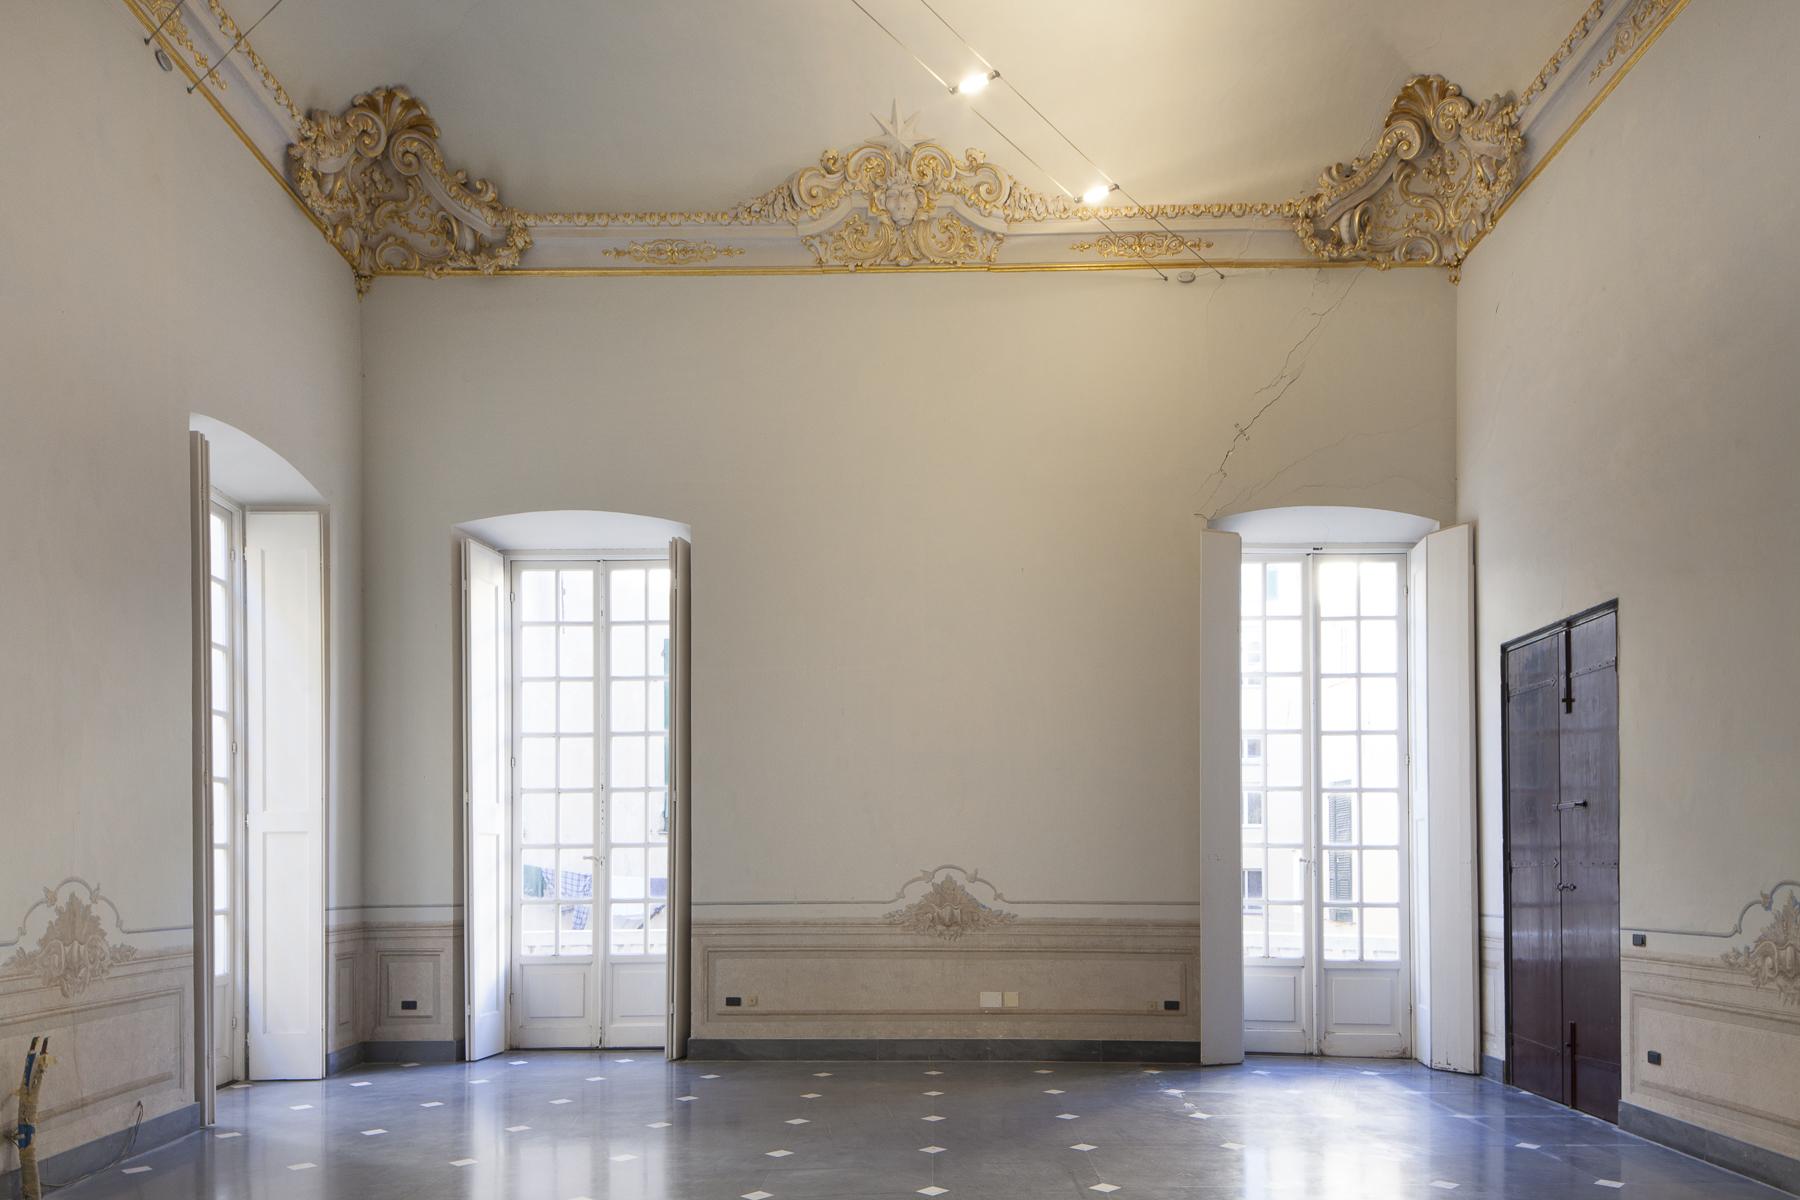 Additional photo for property listing at Highly representative apartment Piazza Ferretto Genoa, Genoa 16123 Italie